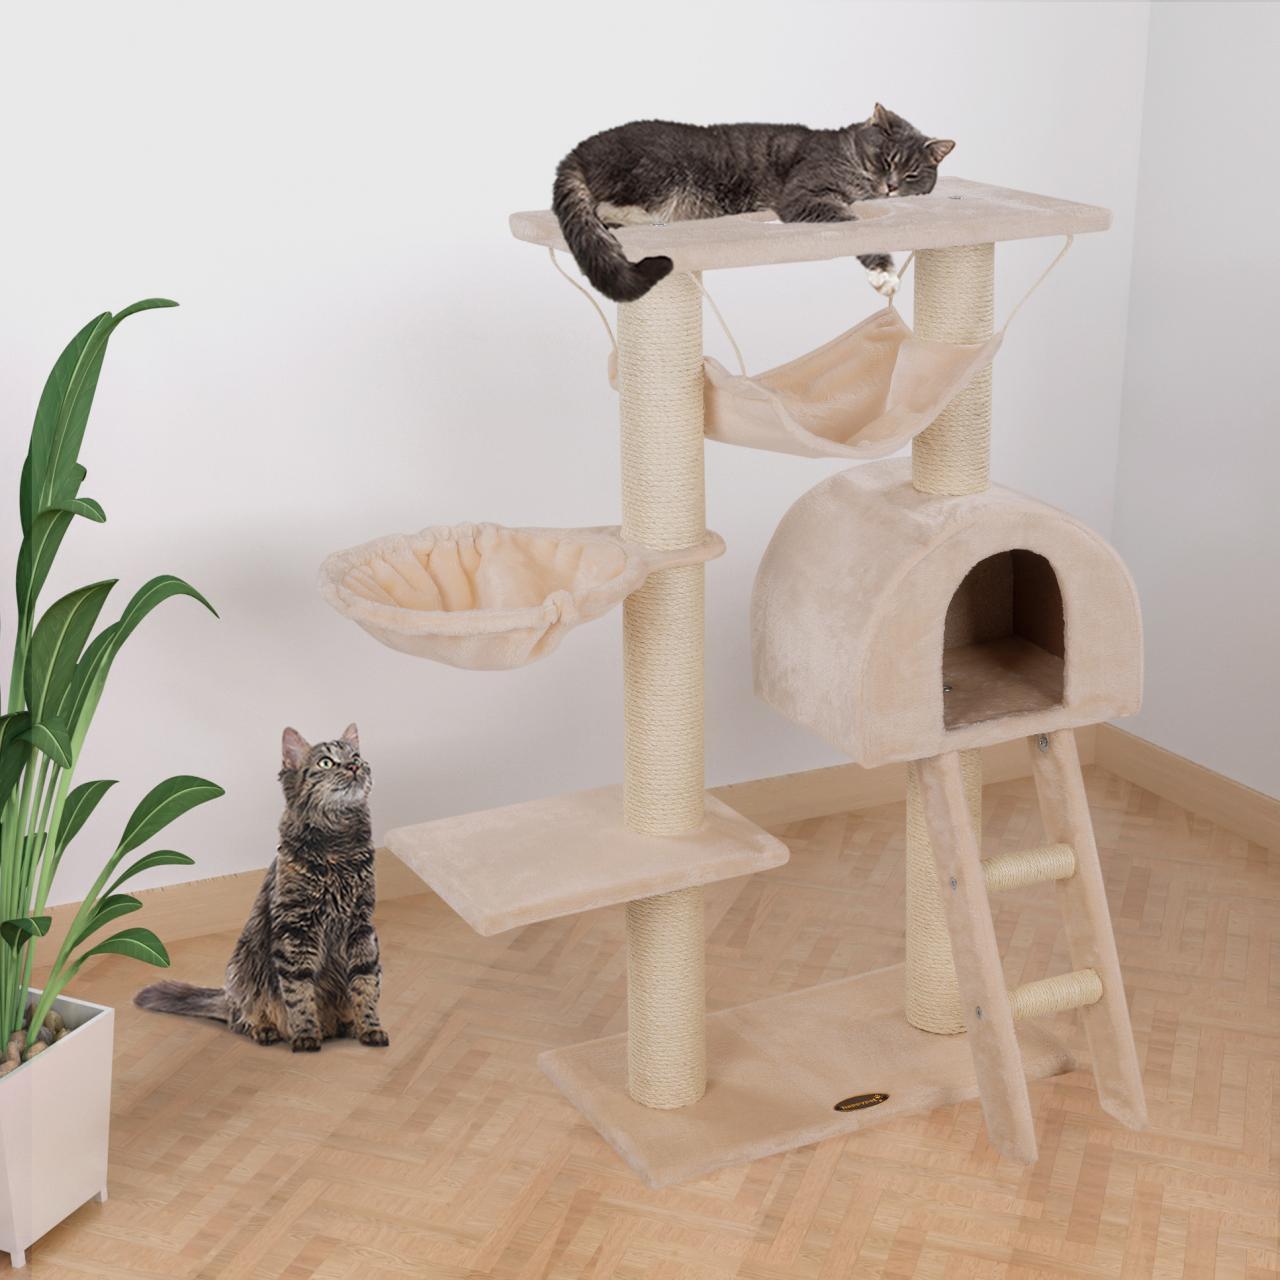 CAT018_05.jpg